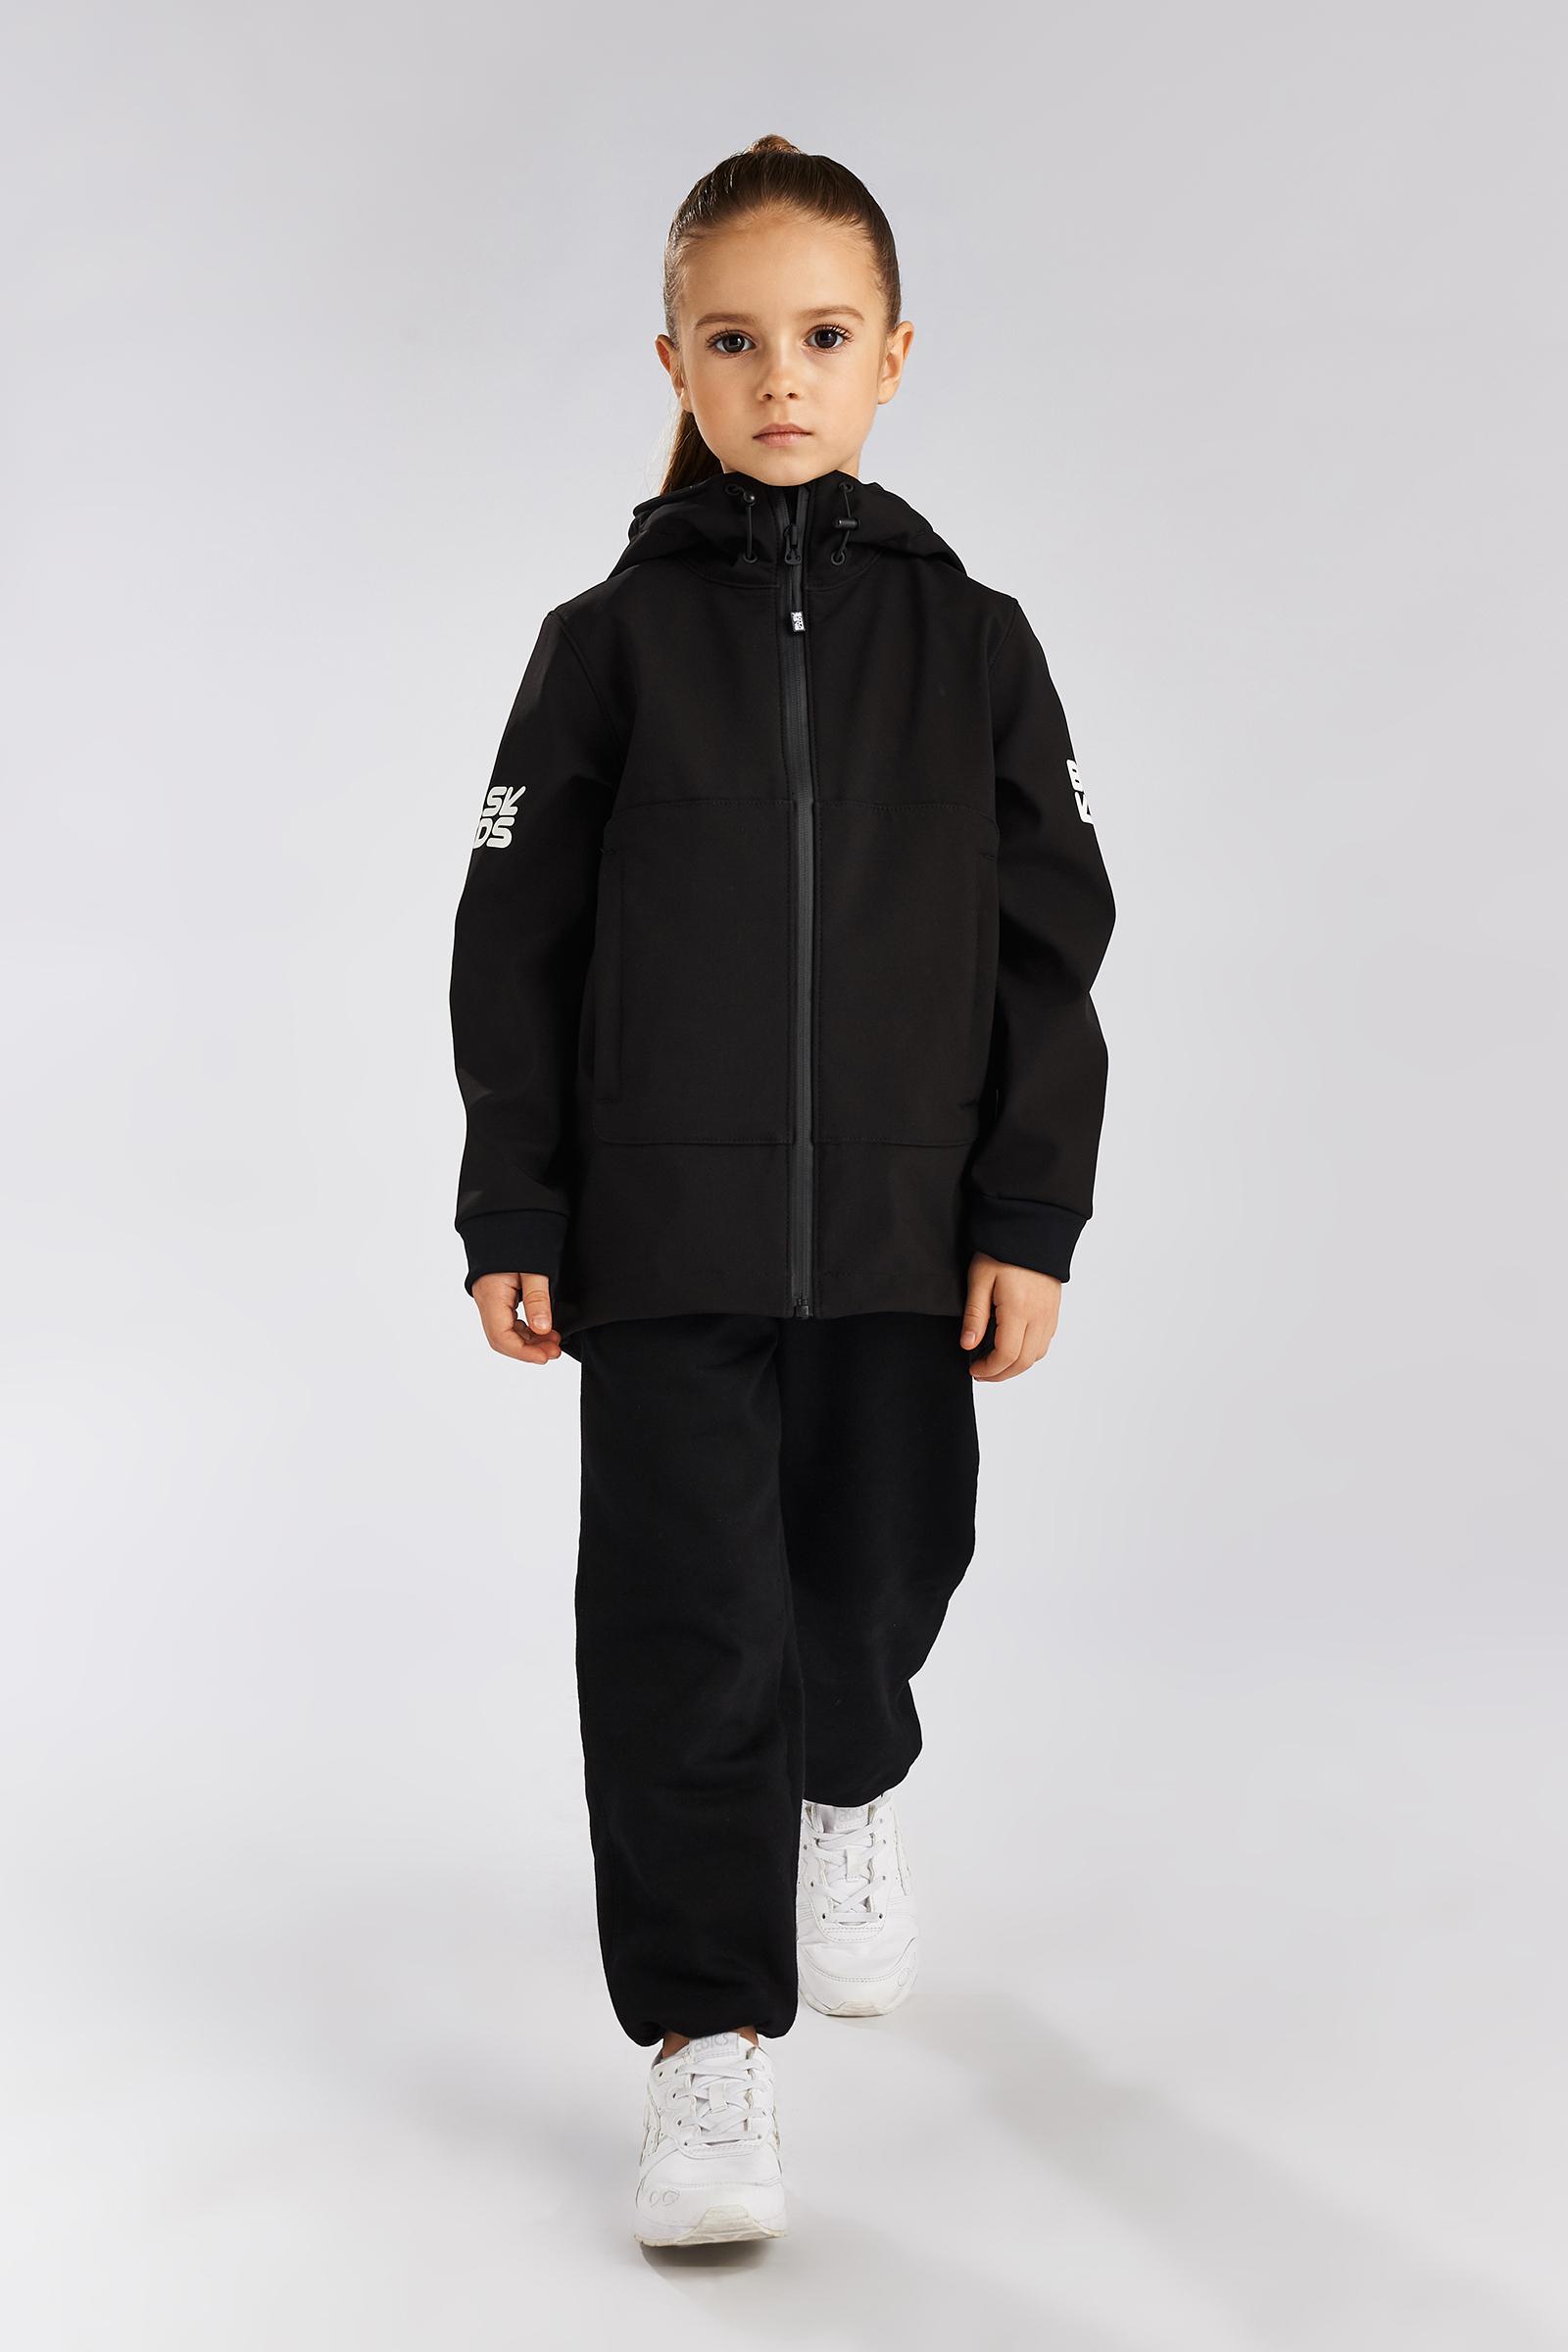 Куртка BASK kids BRUNI фото